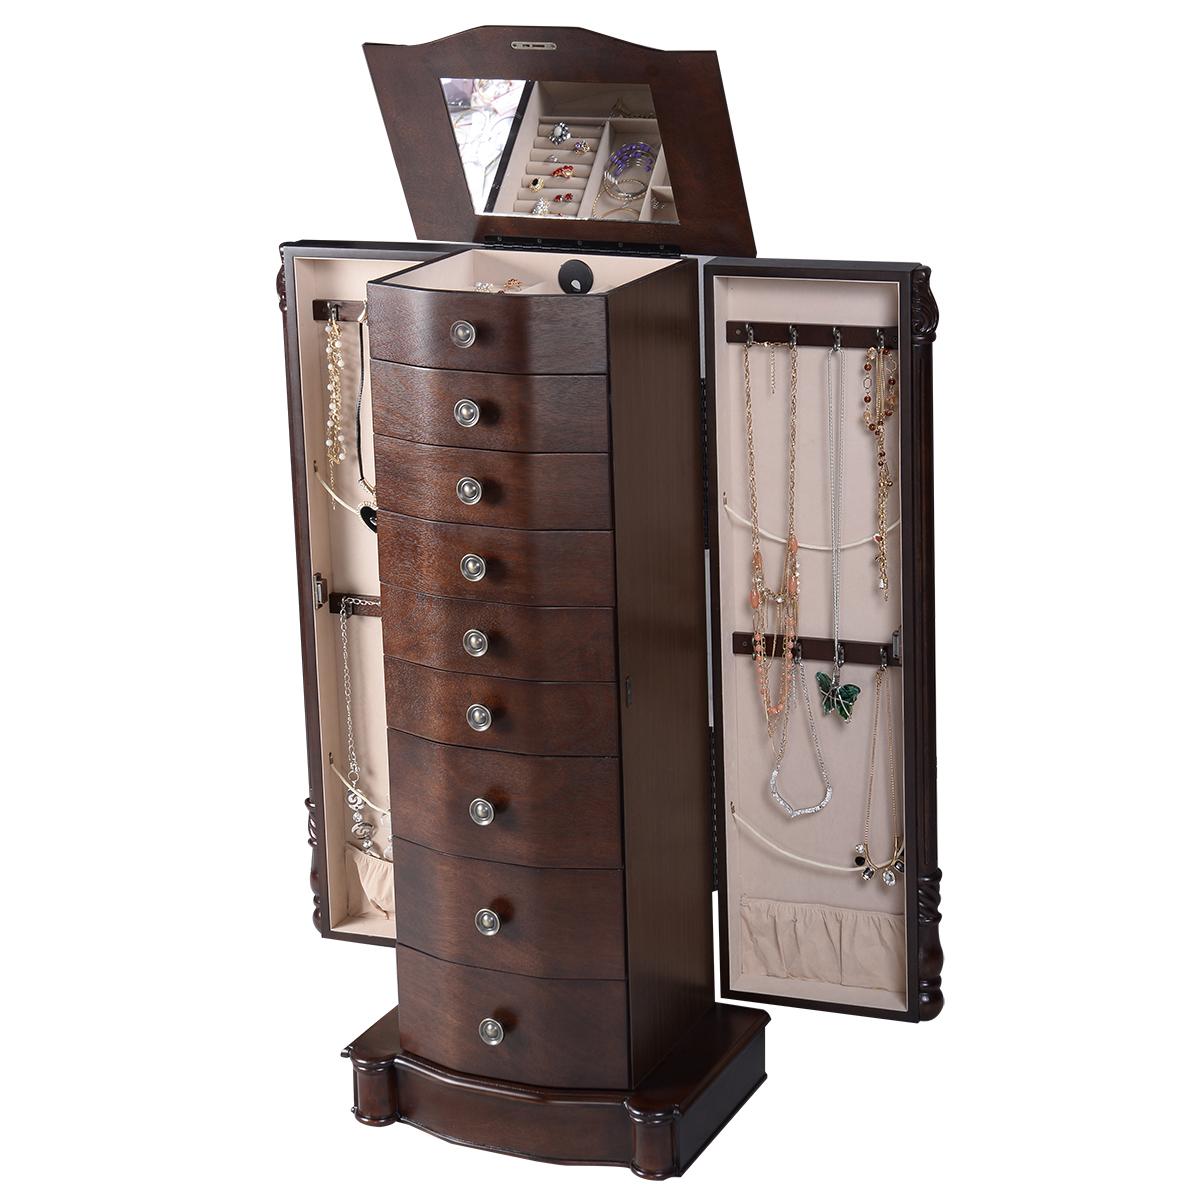 Large Wooden Jewelry Storage Box Organizer